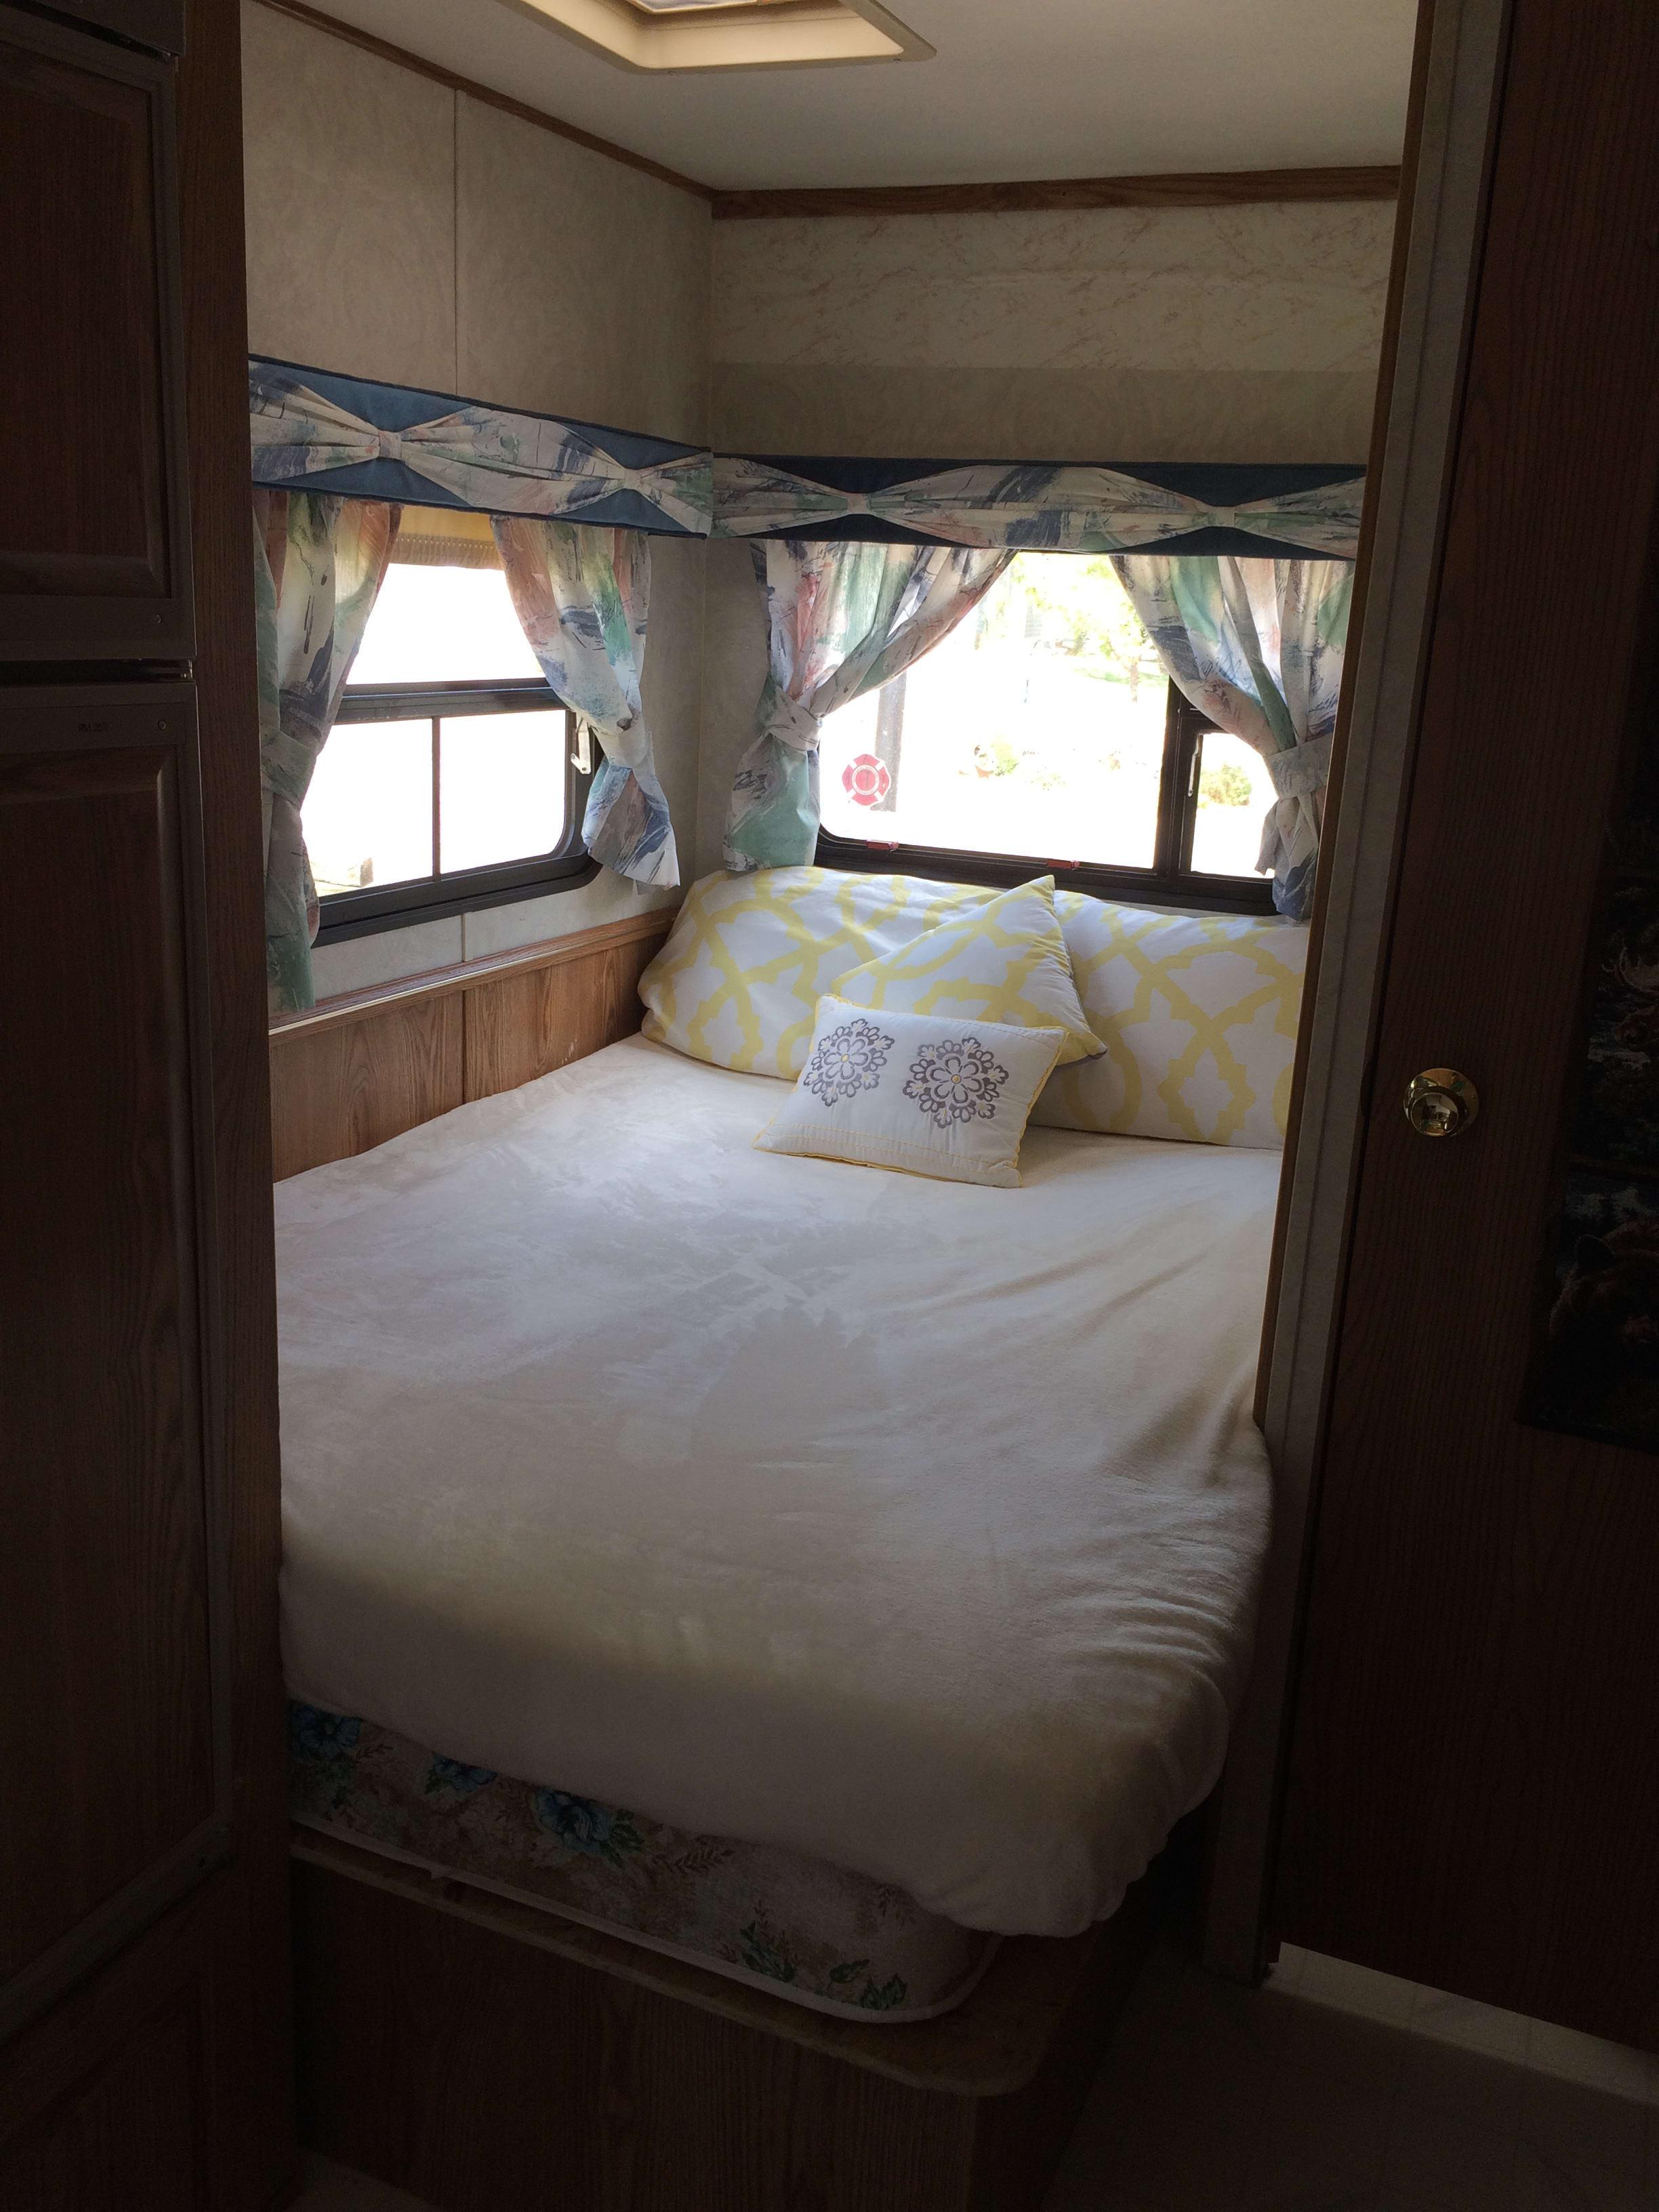 Double Bed accommodates 1 large or 2 medium adults comfortably. Kit Sportsmaster 1994